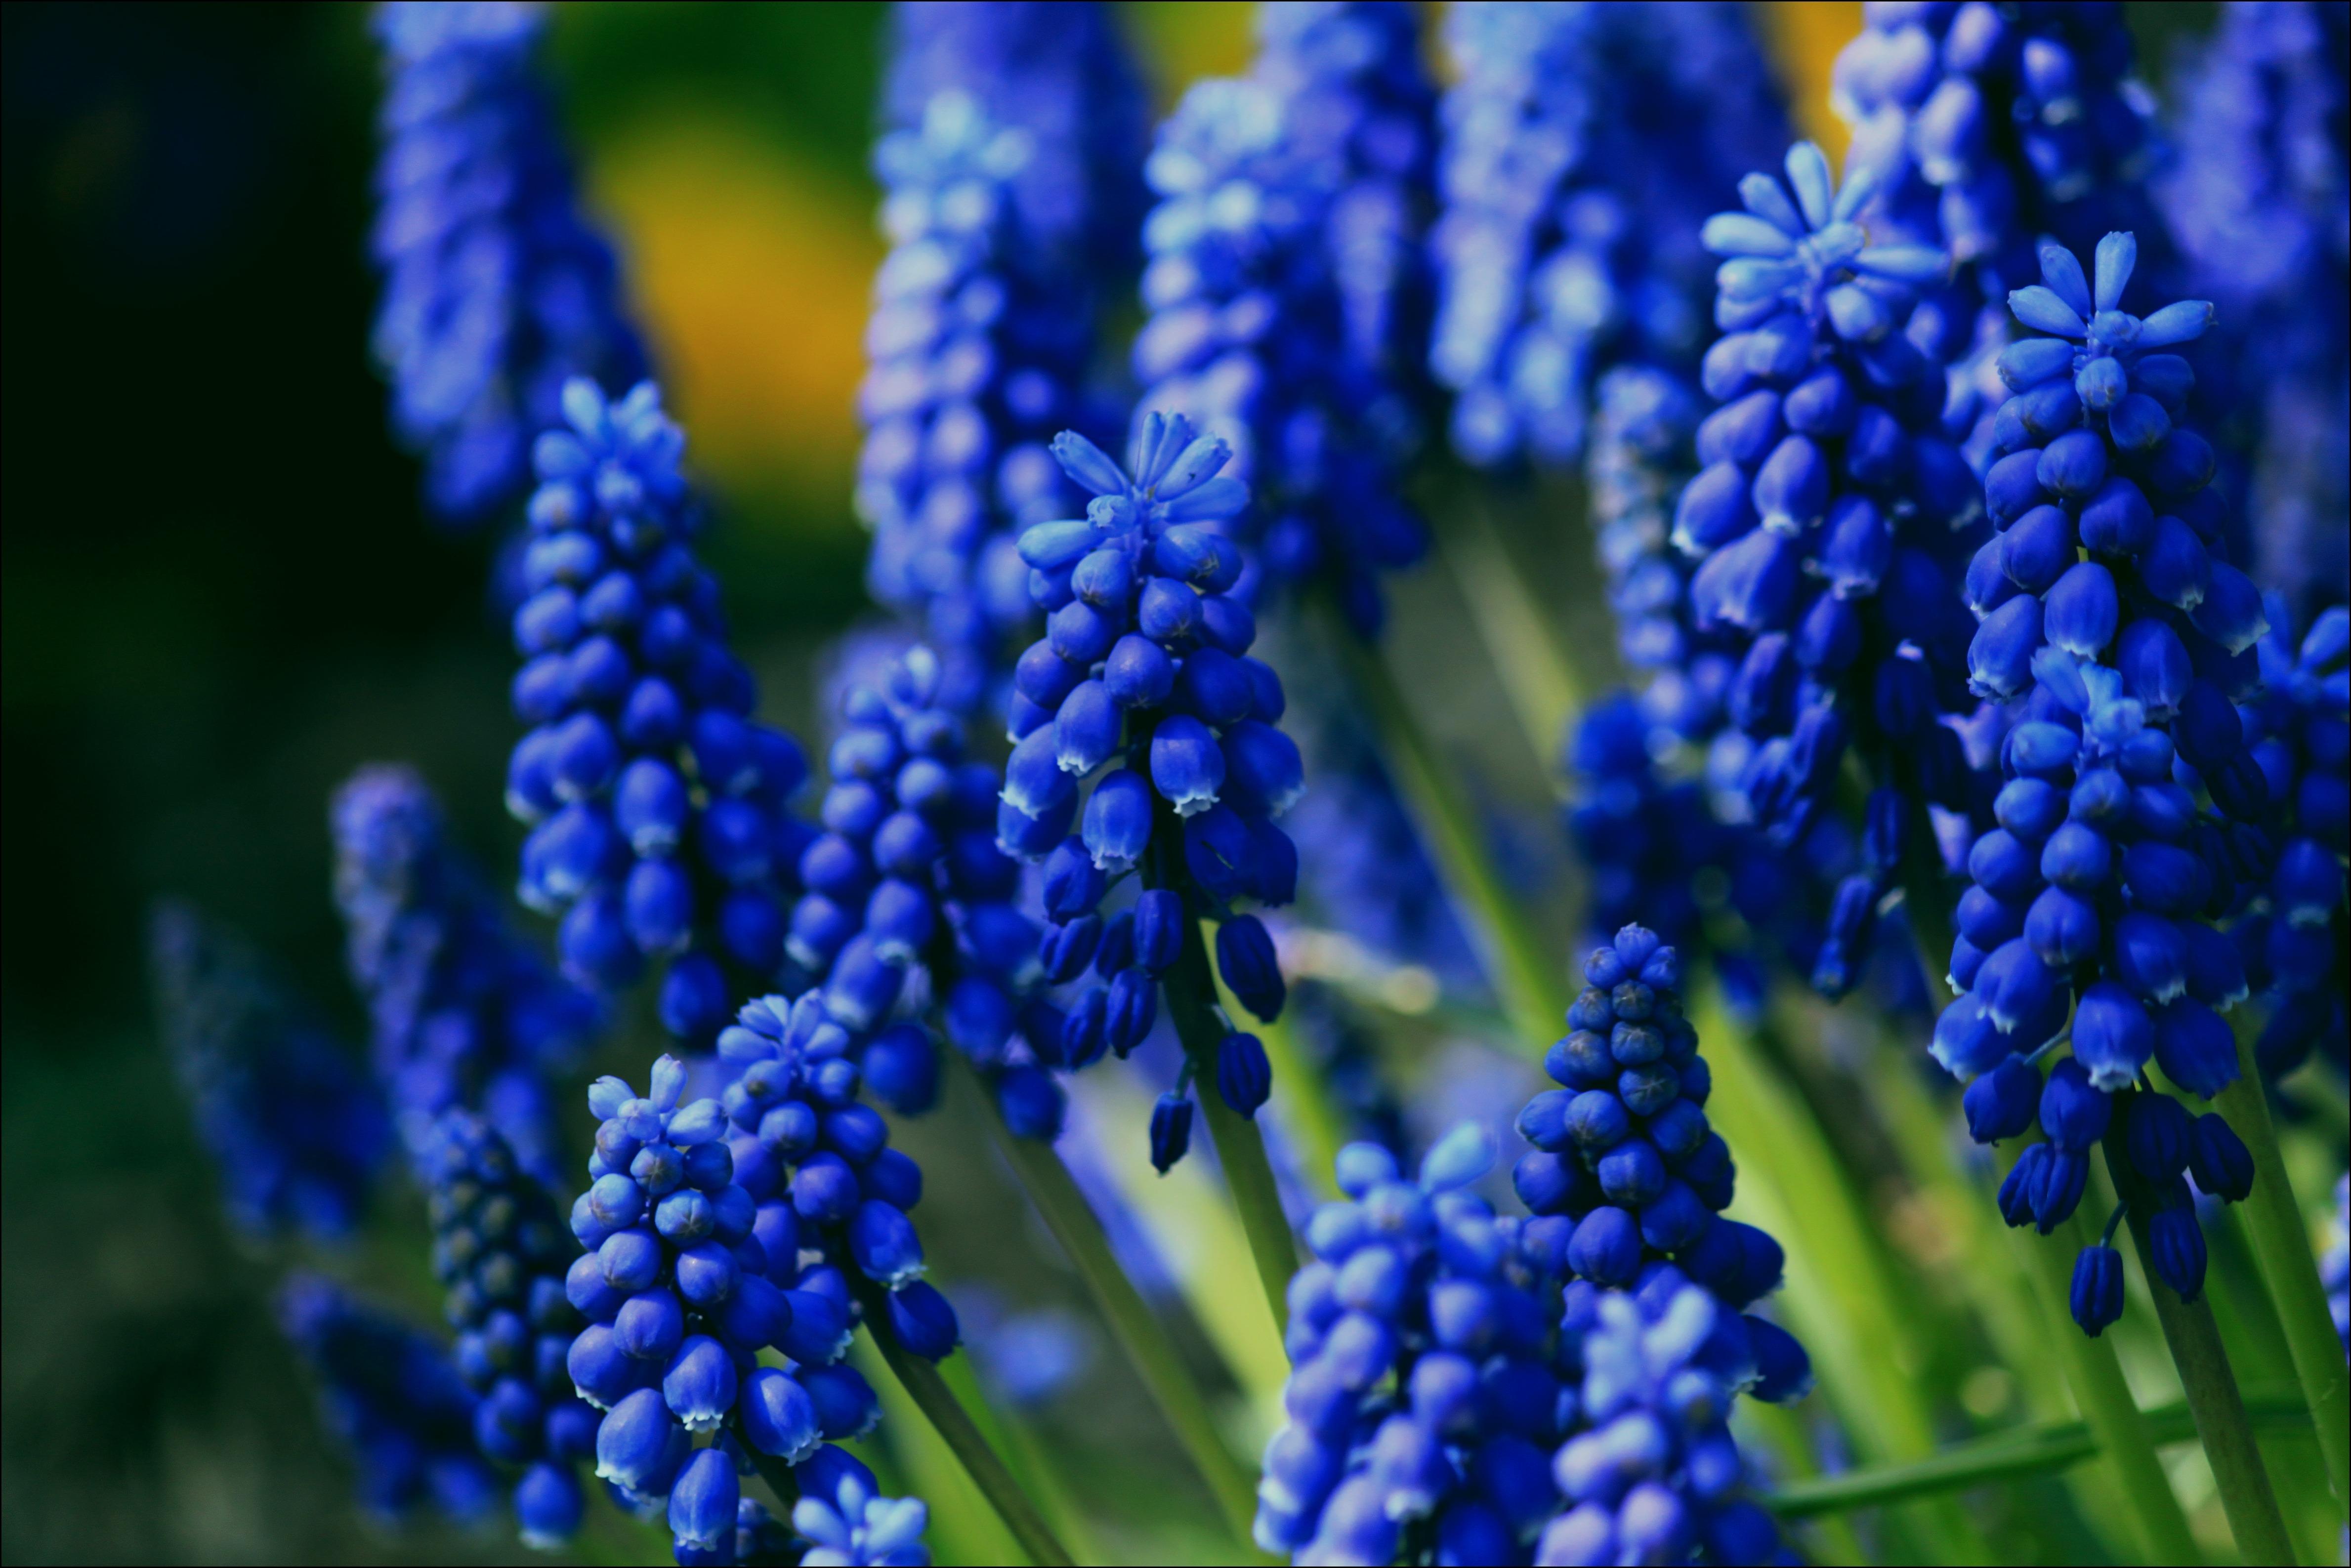 Muscari, Blue, Flower, Fragrance, Fresh, HQ Photo